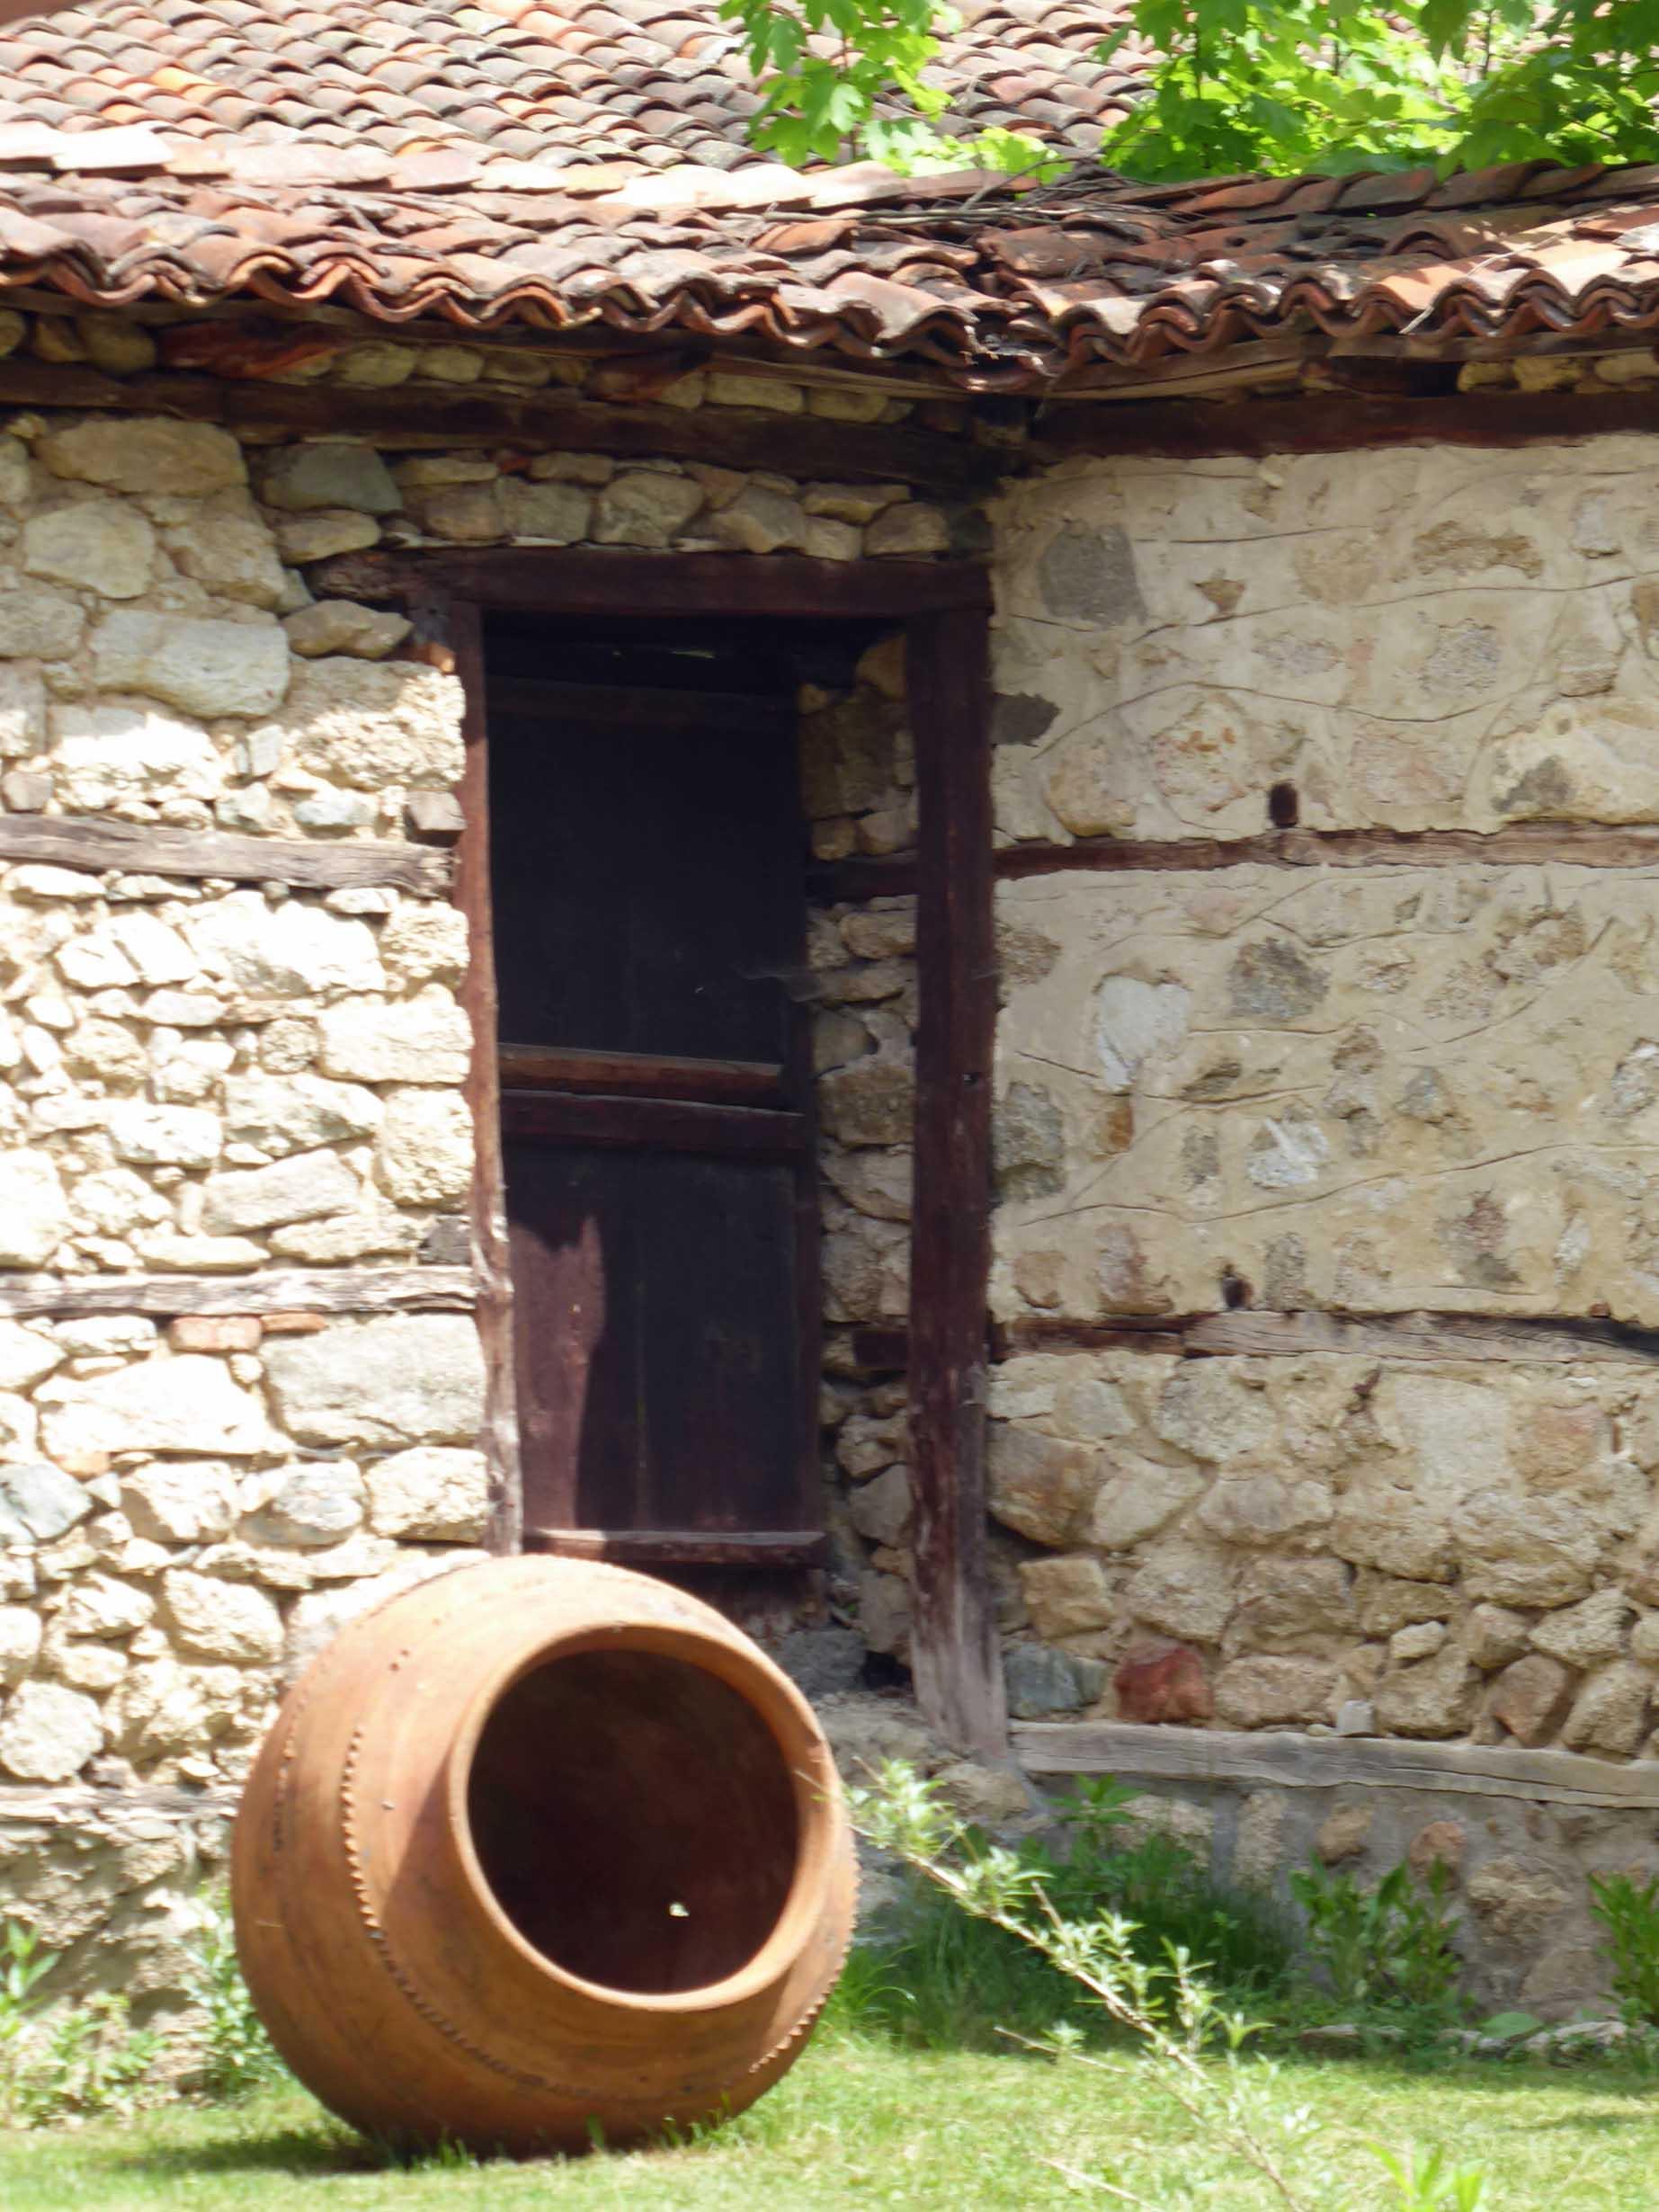 Stone wall and terracotta urn